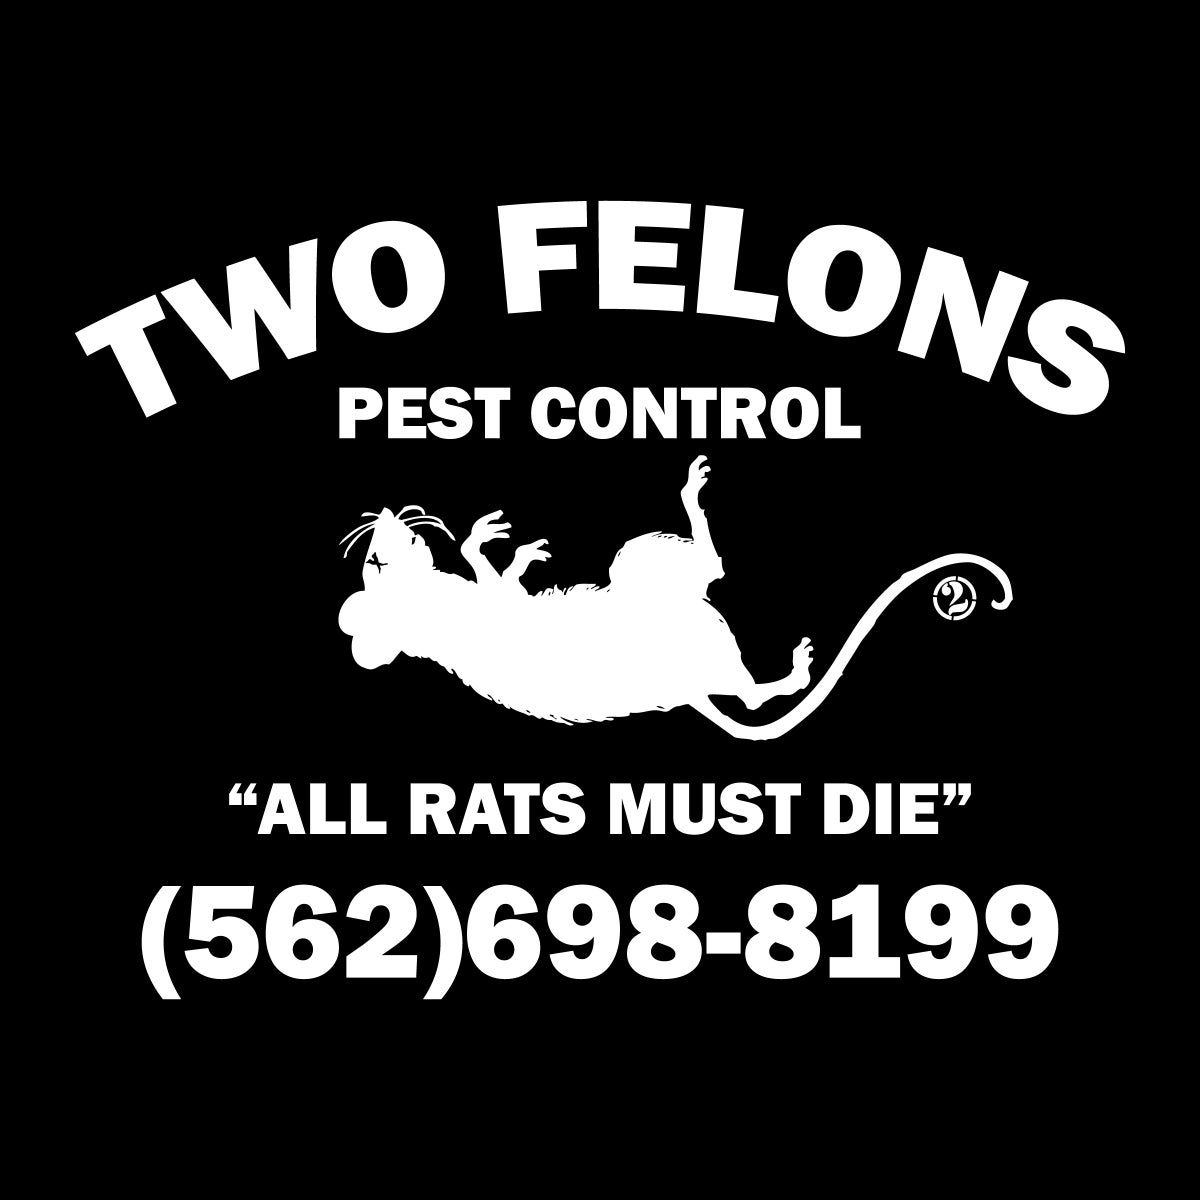 "Two Felons ""Pest Control"" (black)"